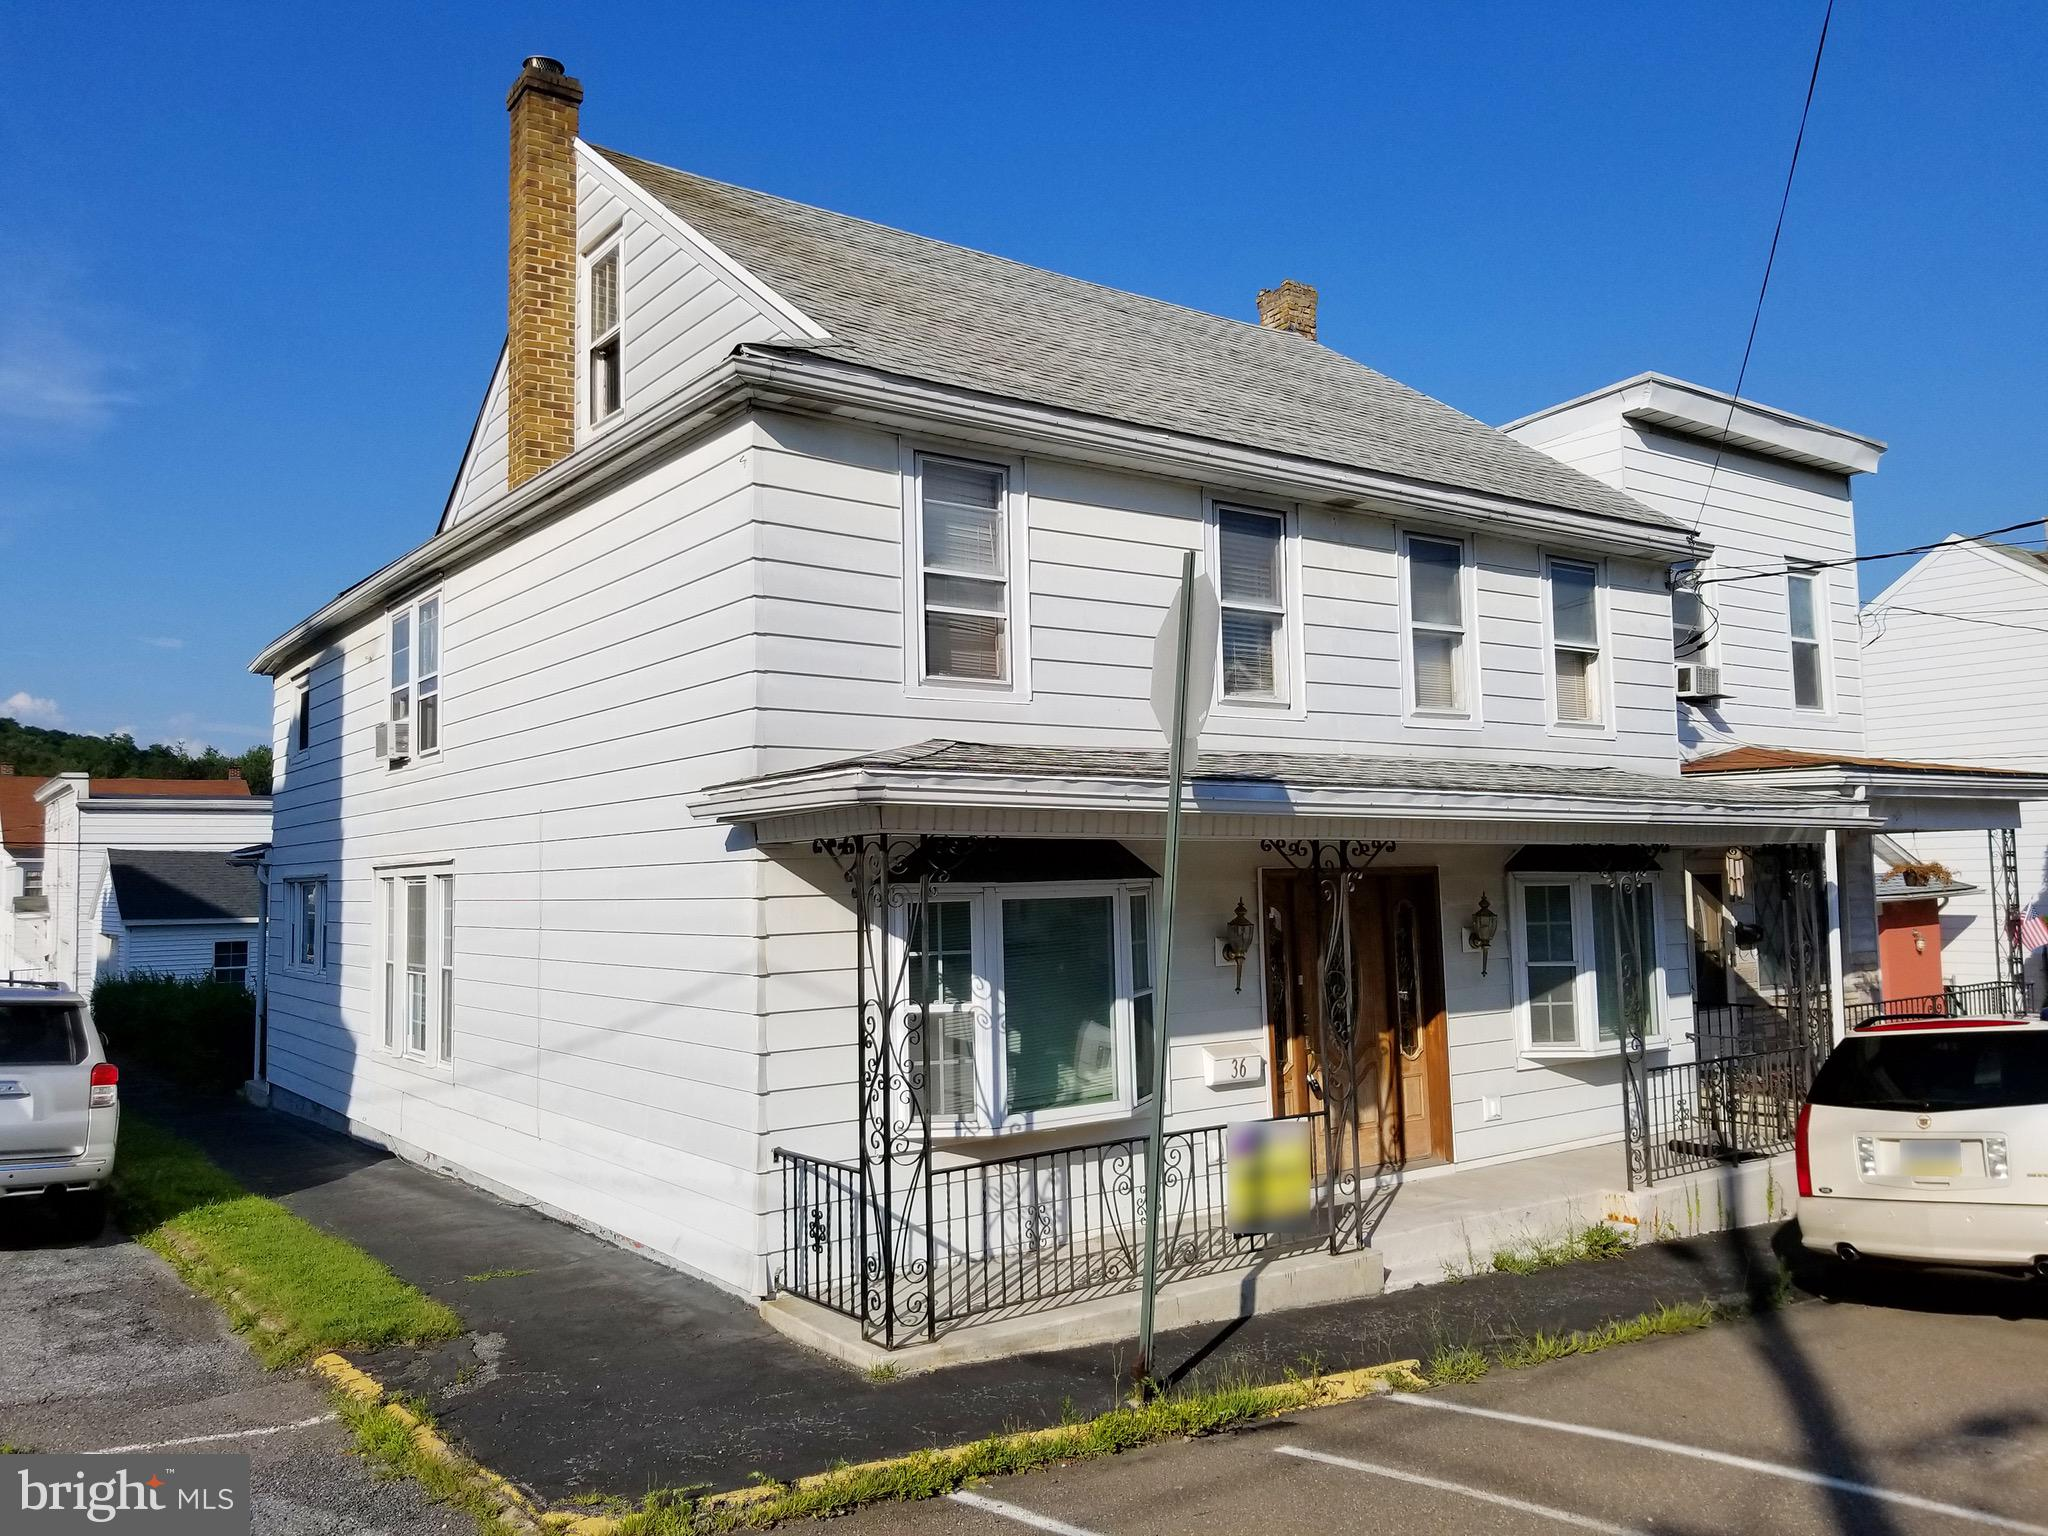 36 CLAY STREET, NEW PHILADELPHIA, PA 17959